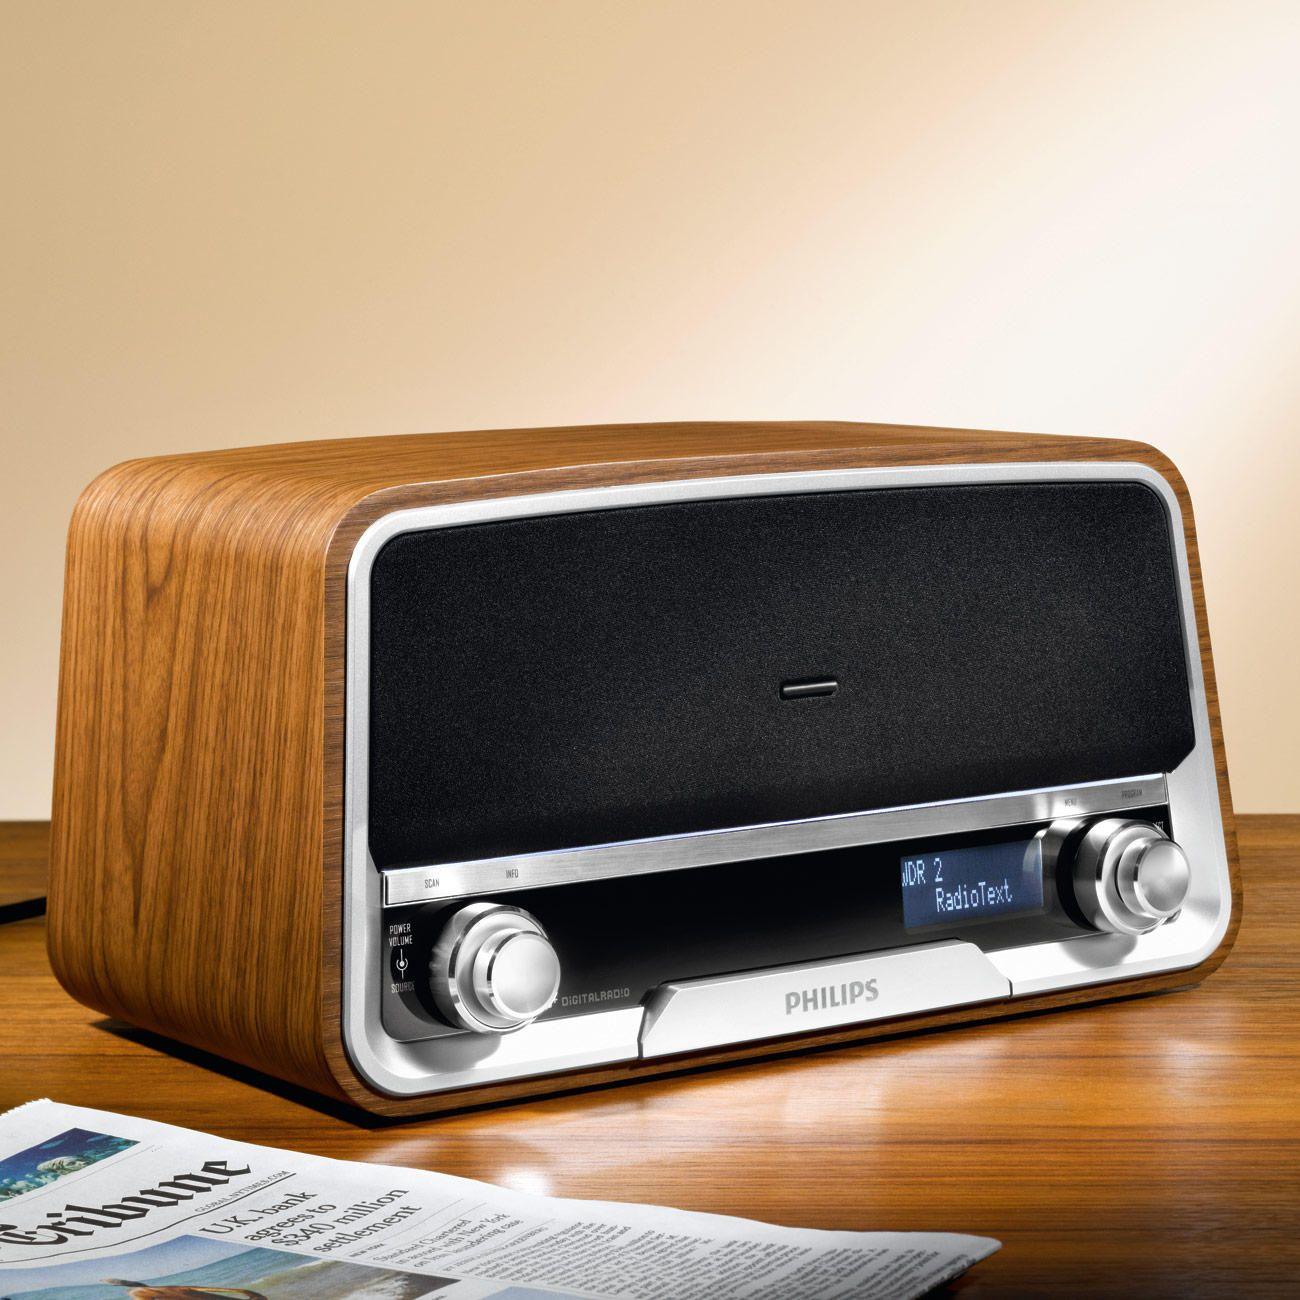 philips retro radio ord7300 goedkoop online kopen nice. Black Bedroom Furniture Sets. Home Design Ideas